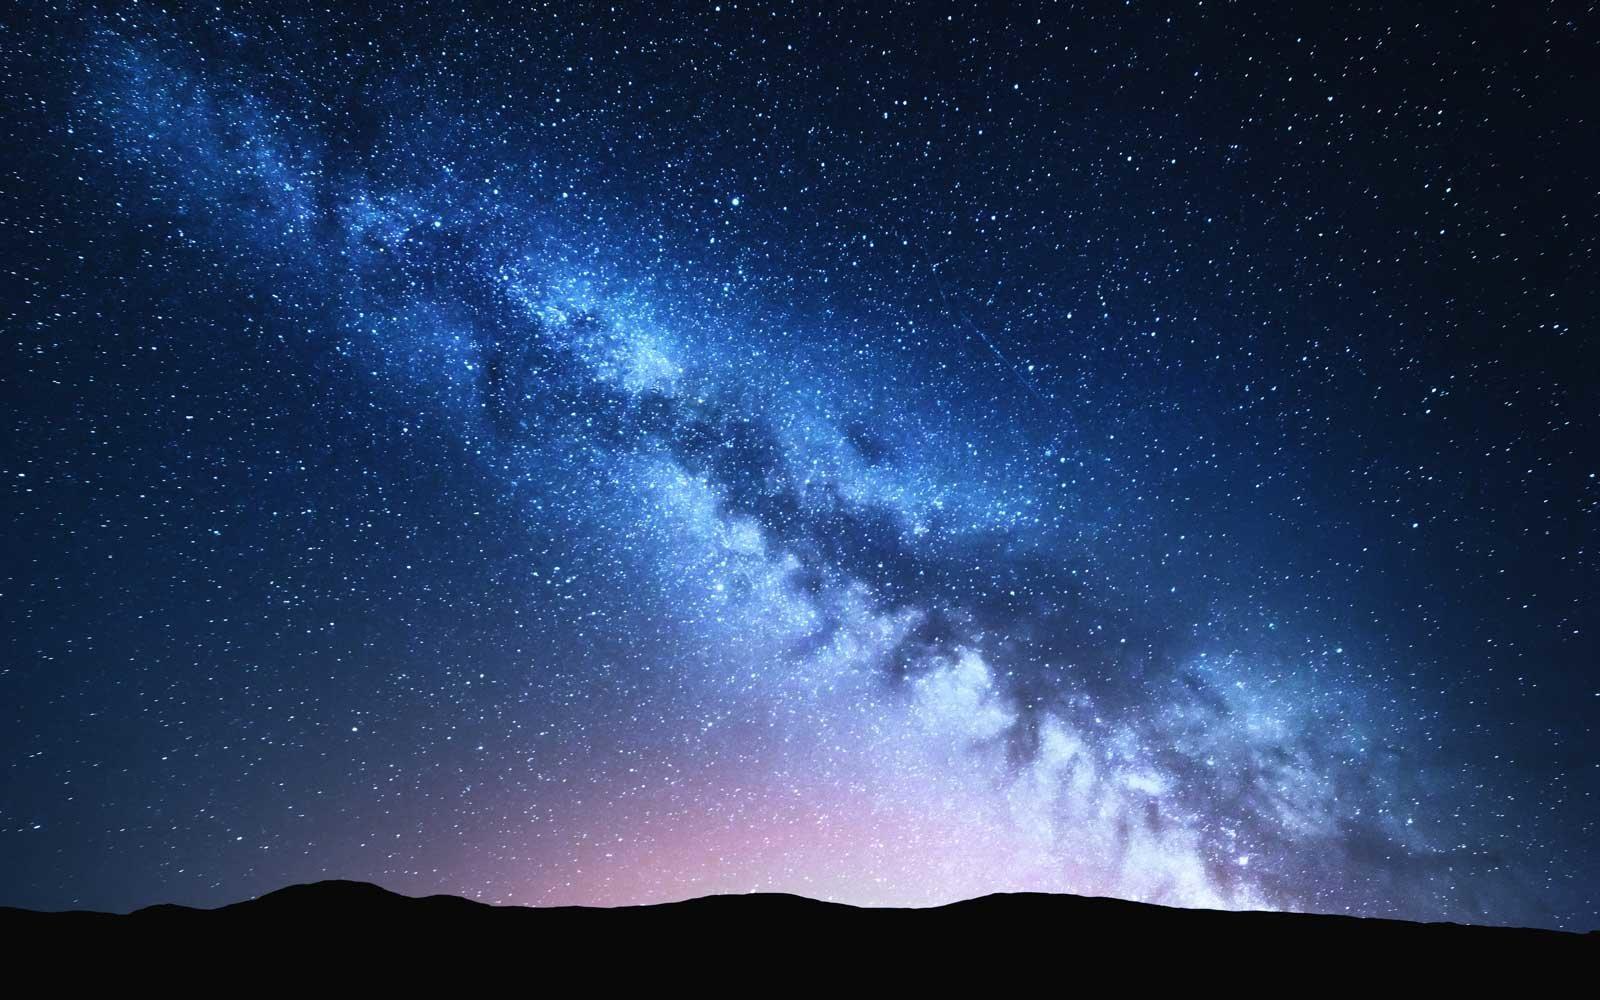 milky-way-stars-from-earth.jpg